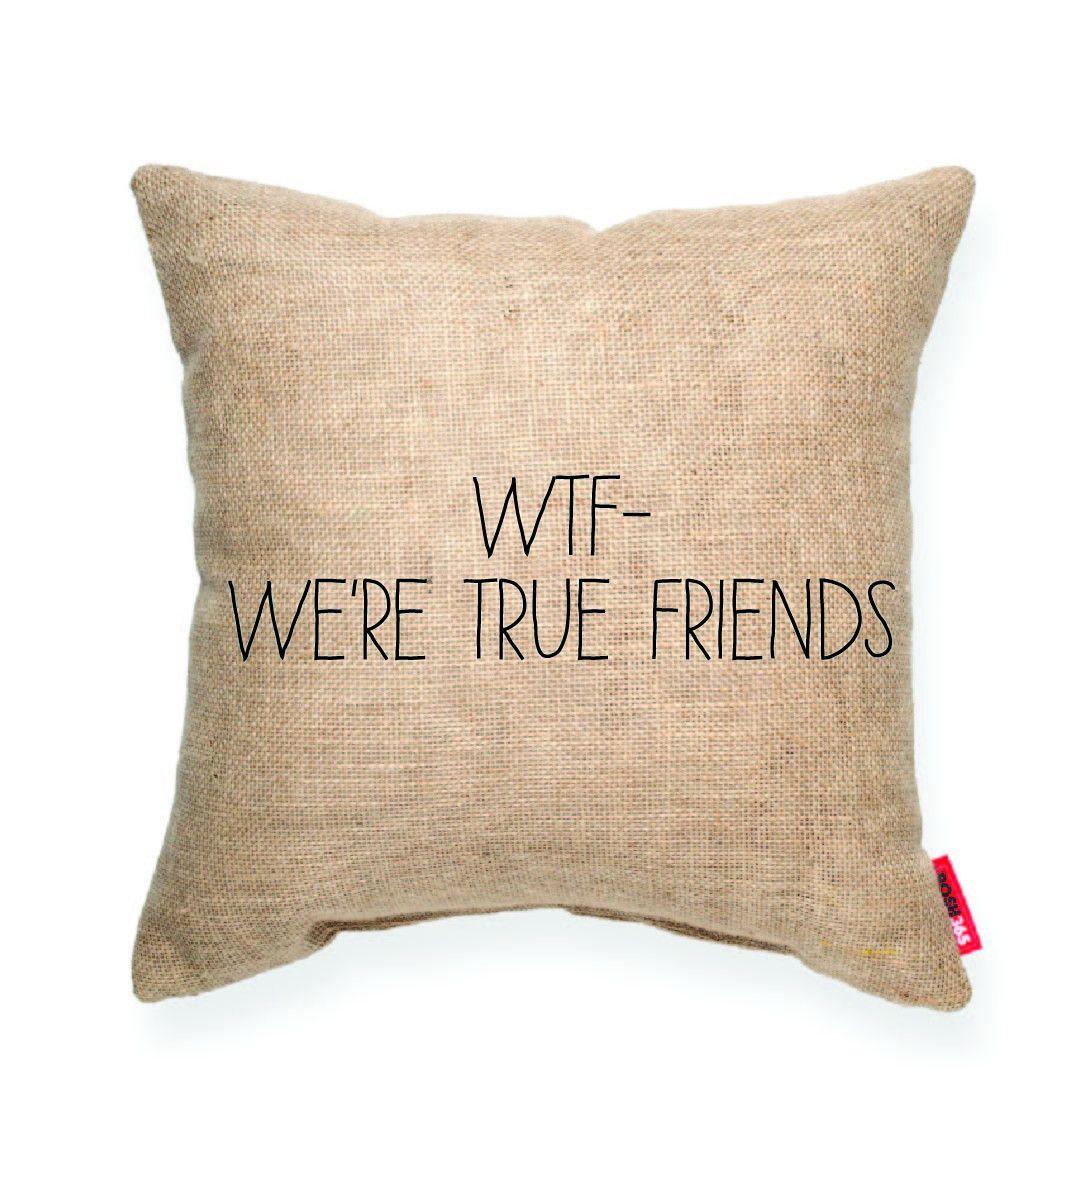 WTF = We're True Friends ... haha! pillow